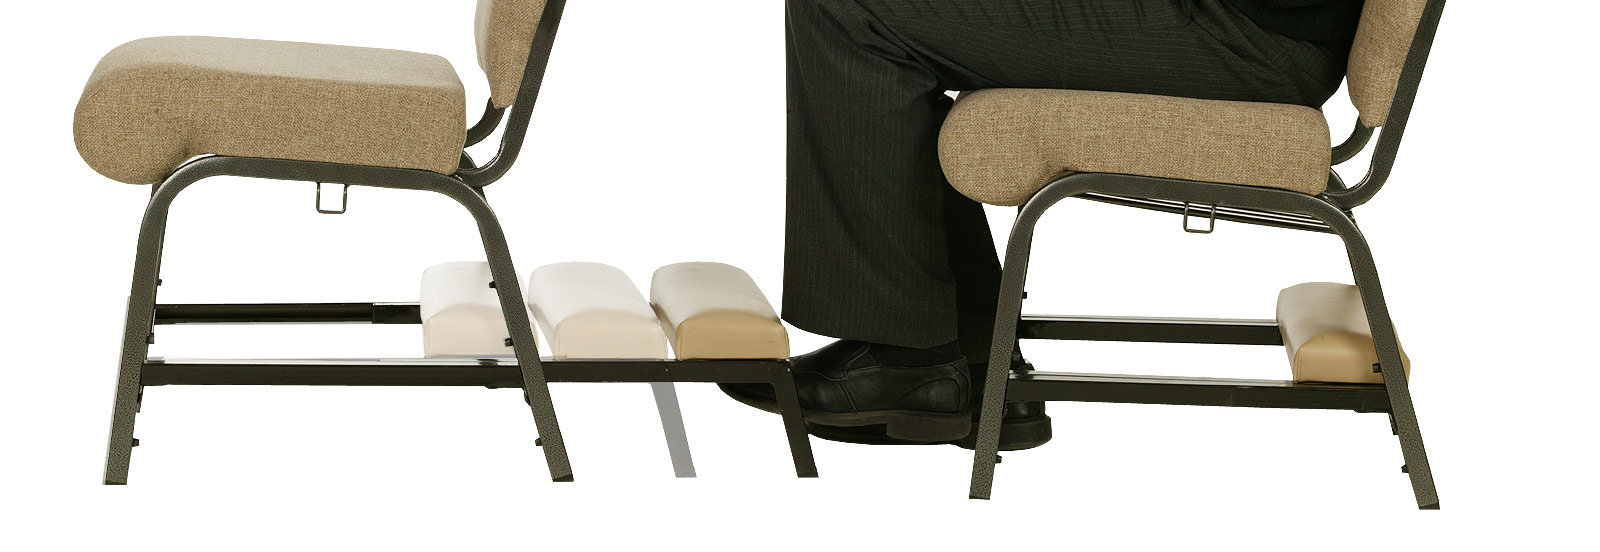 Worship Style - Kneeler Option